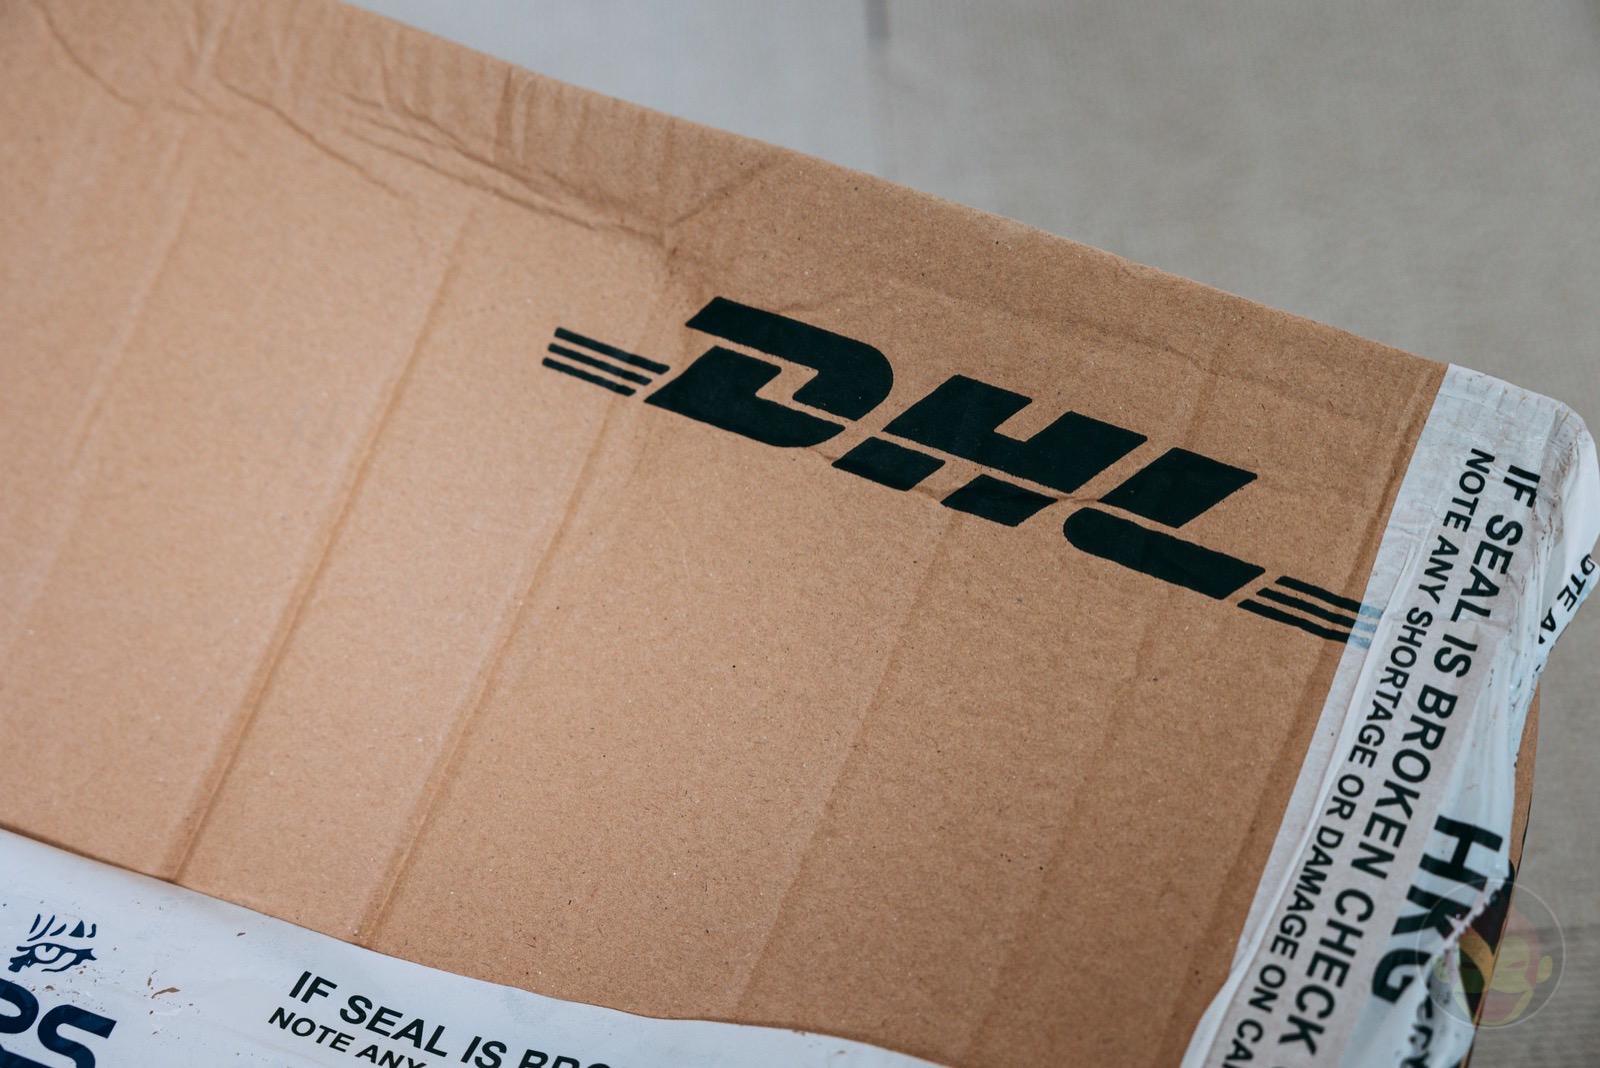 DHL Box 01